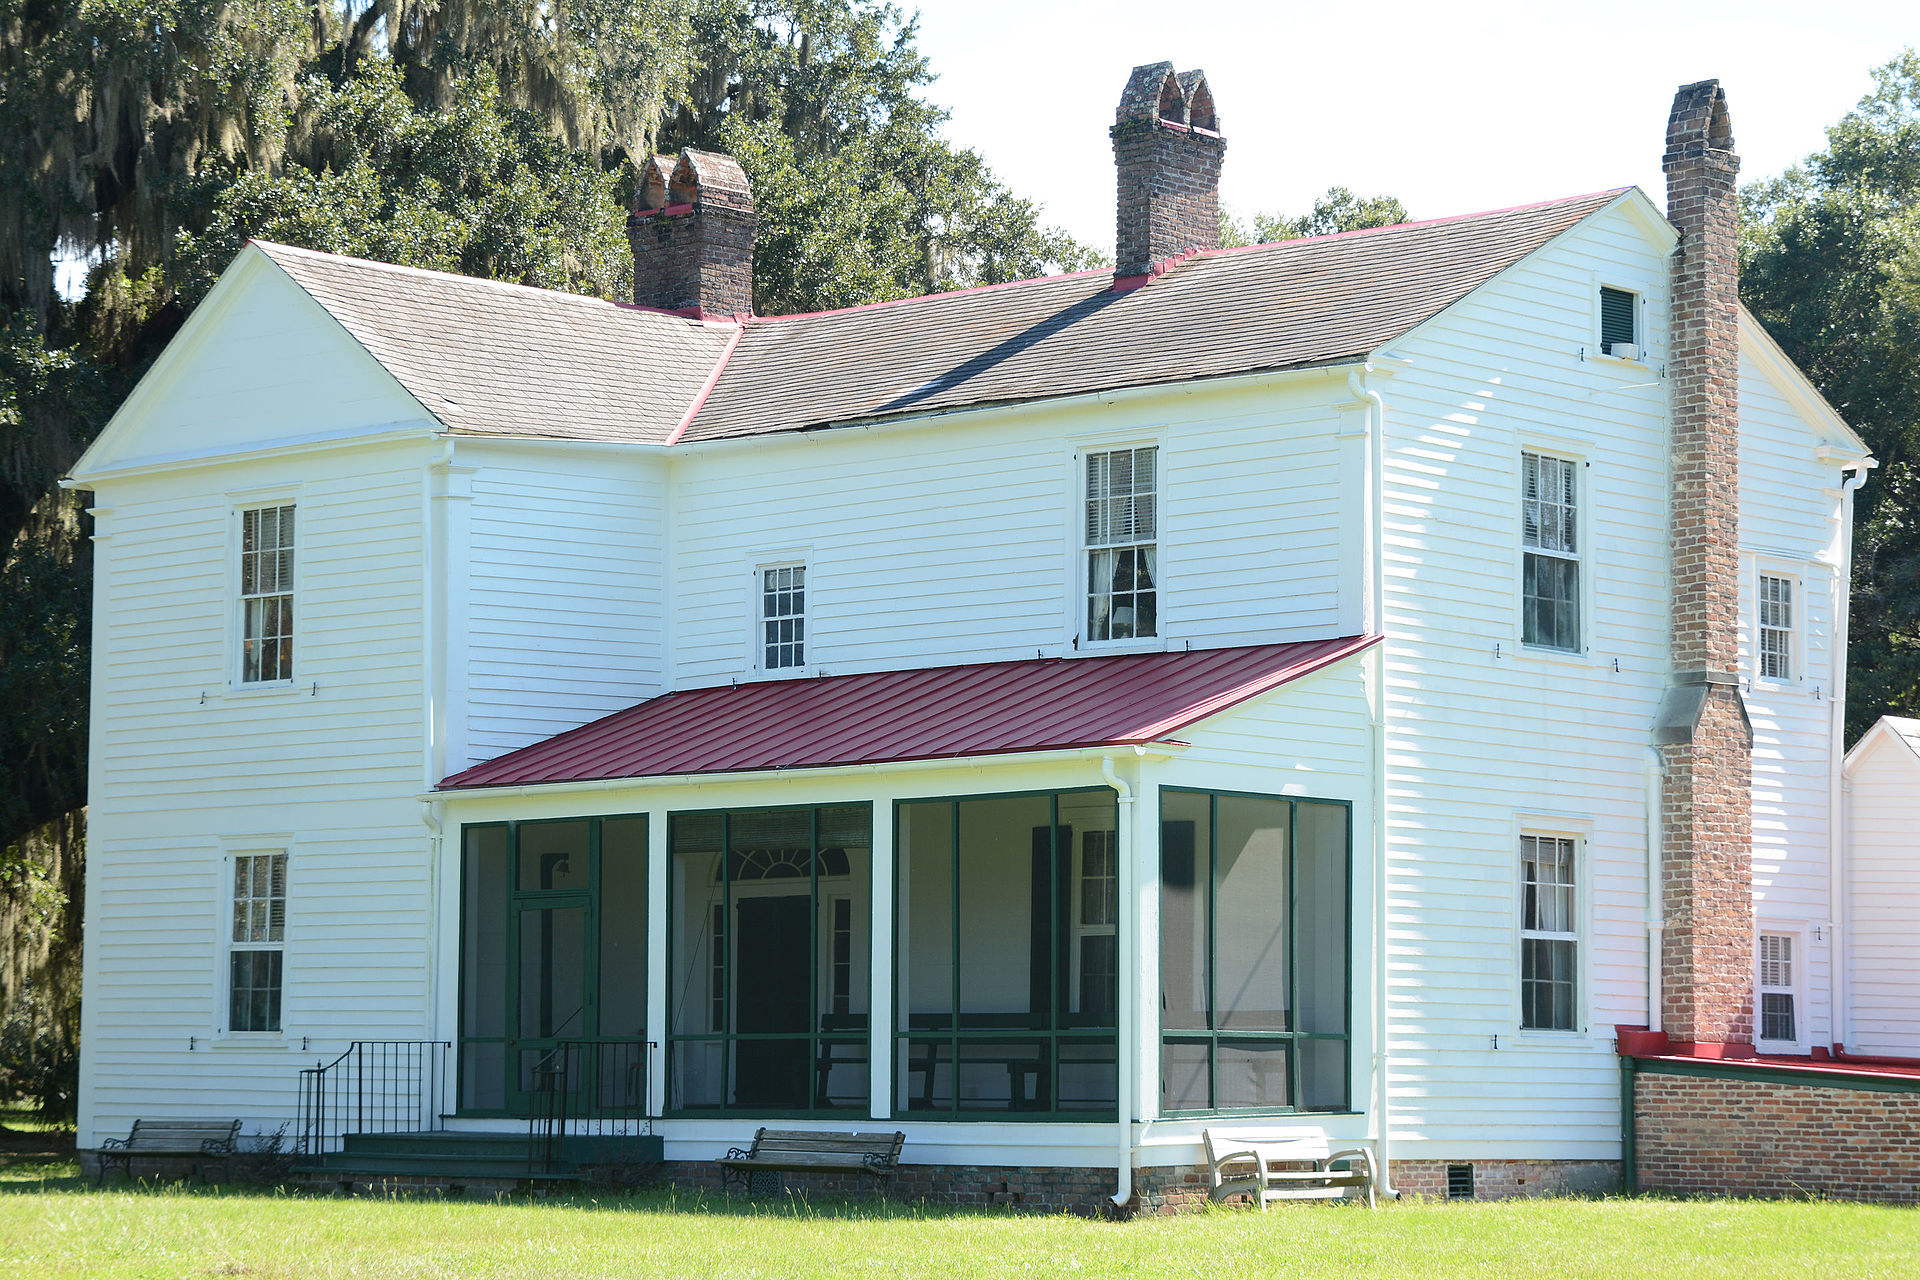 The Hofwyl-Broadfield Plantation house